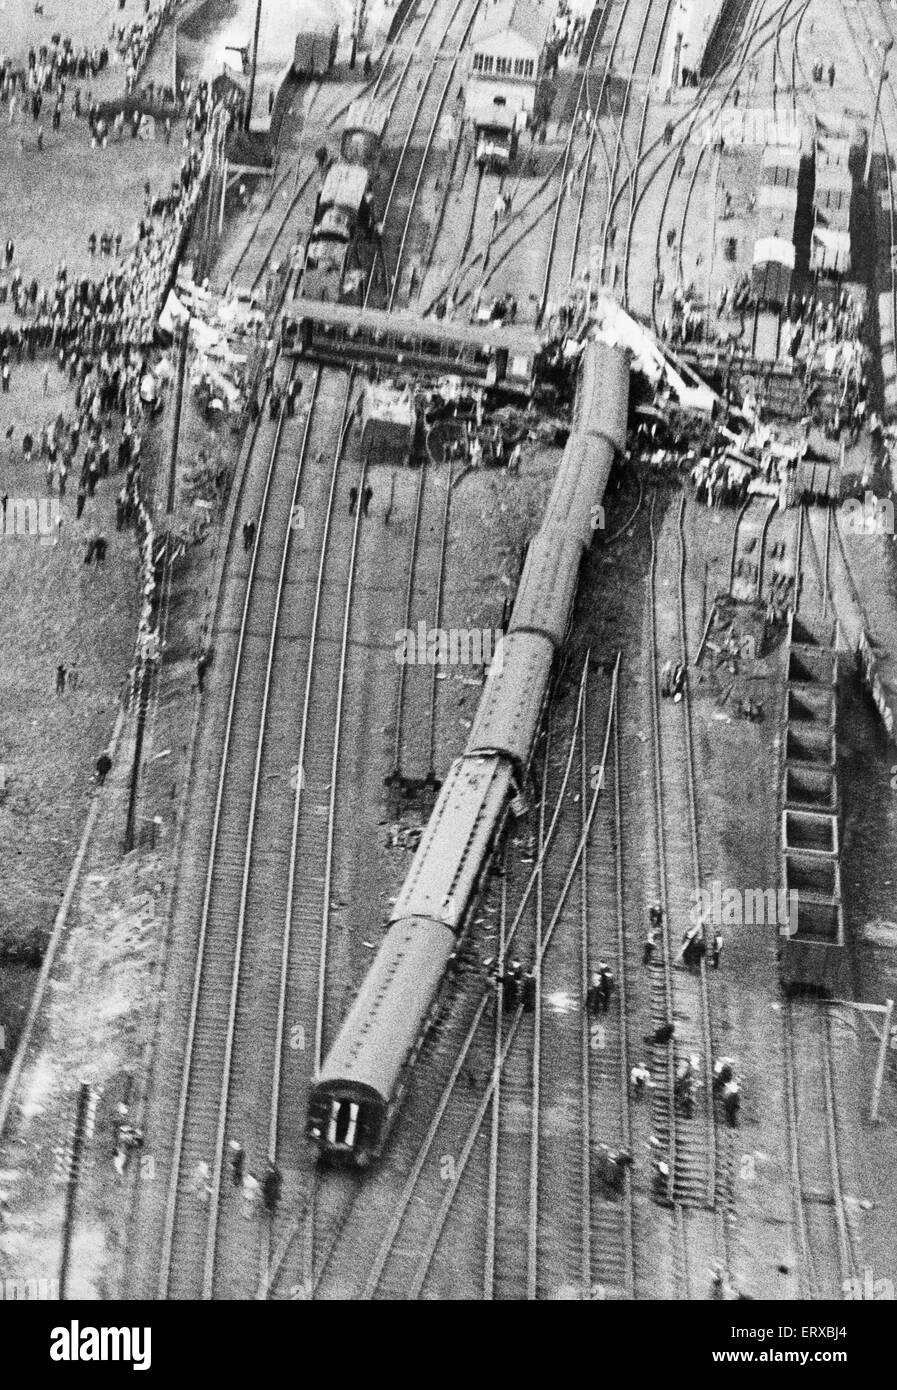 "Leighton Buzzard train crash: Aerial view of the wreckage following the derailment of Royal Scot No. 6114 ""Coldstream Stock Photo"